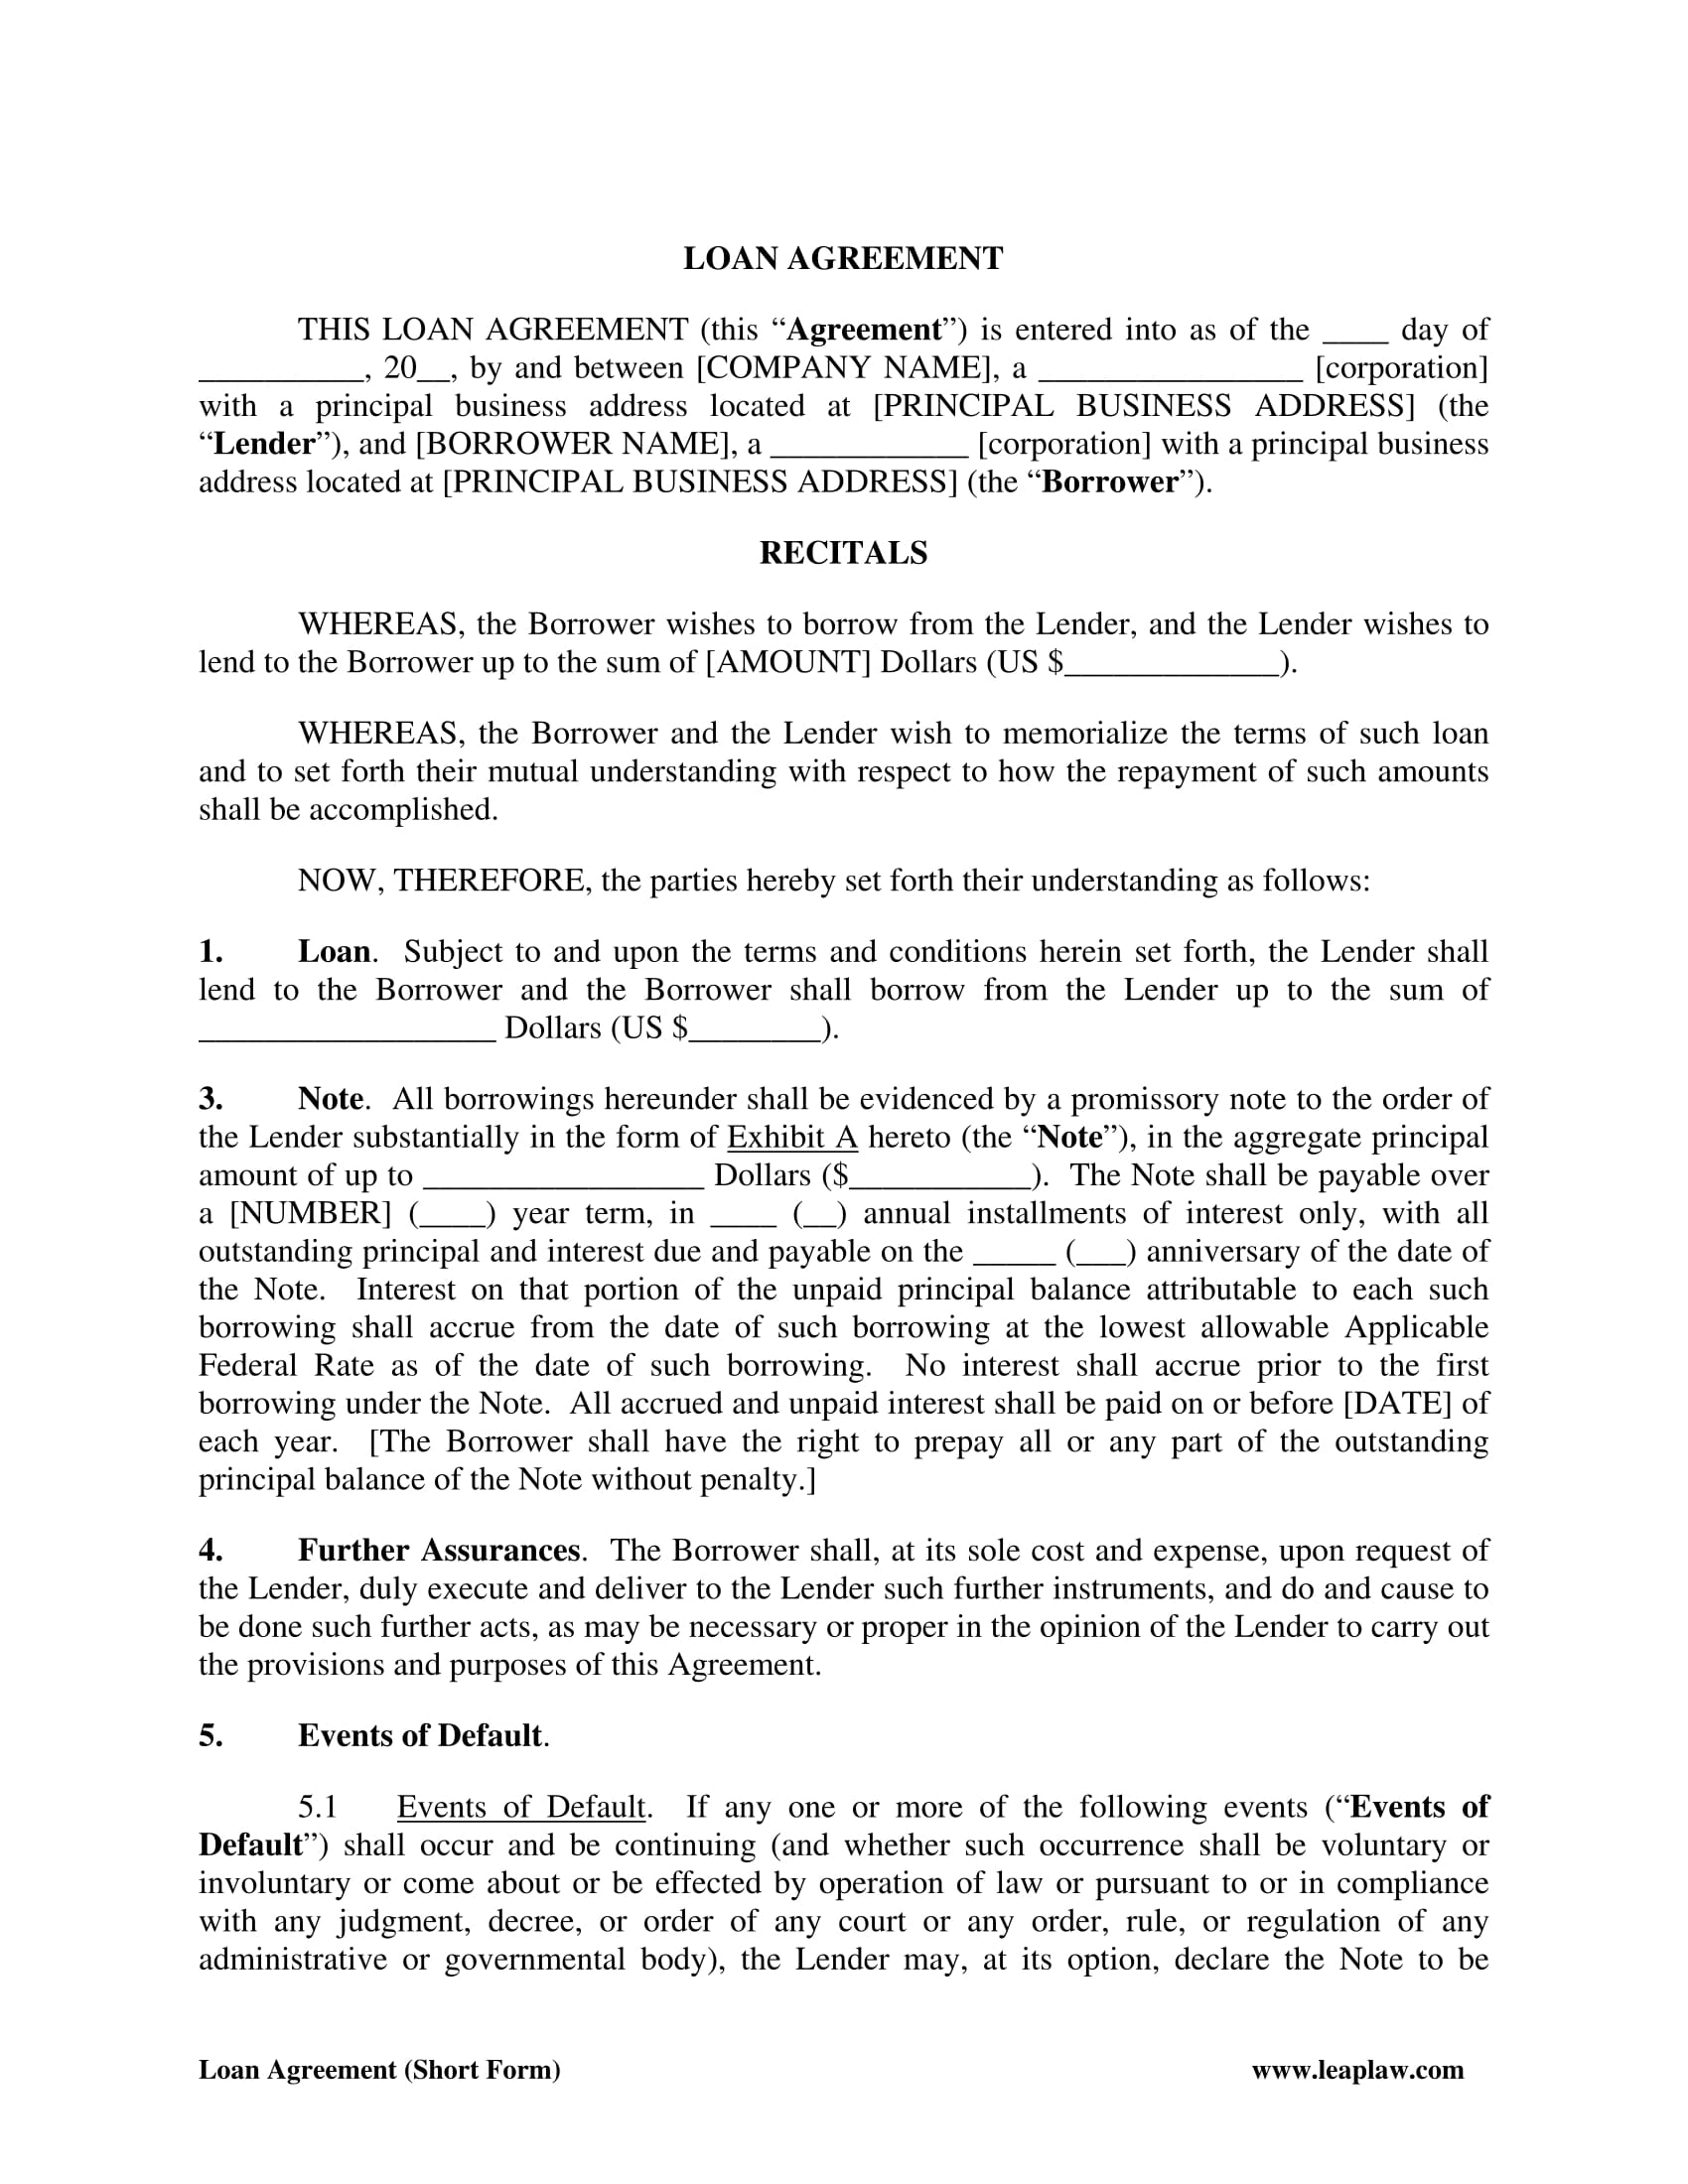 loan agreement form 2